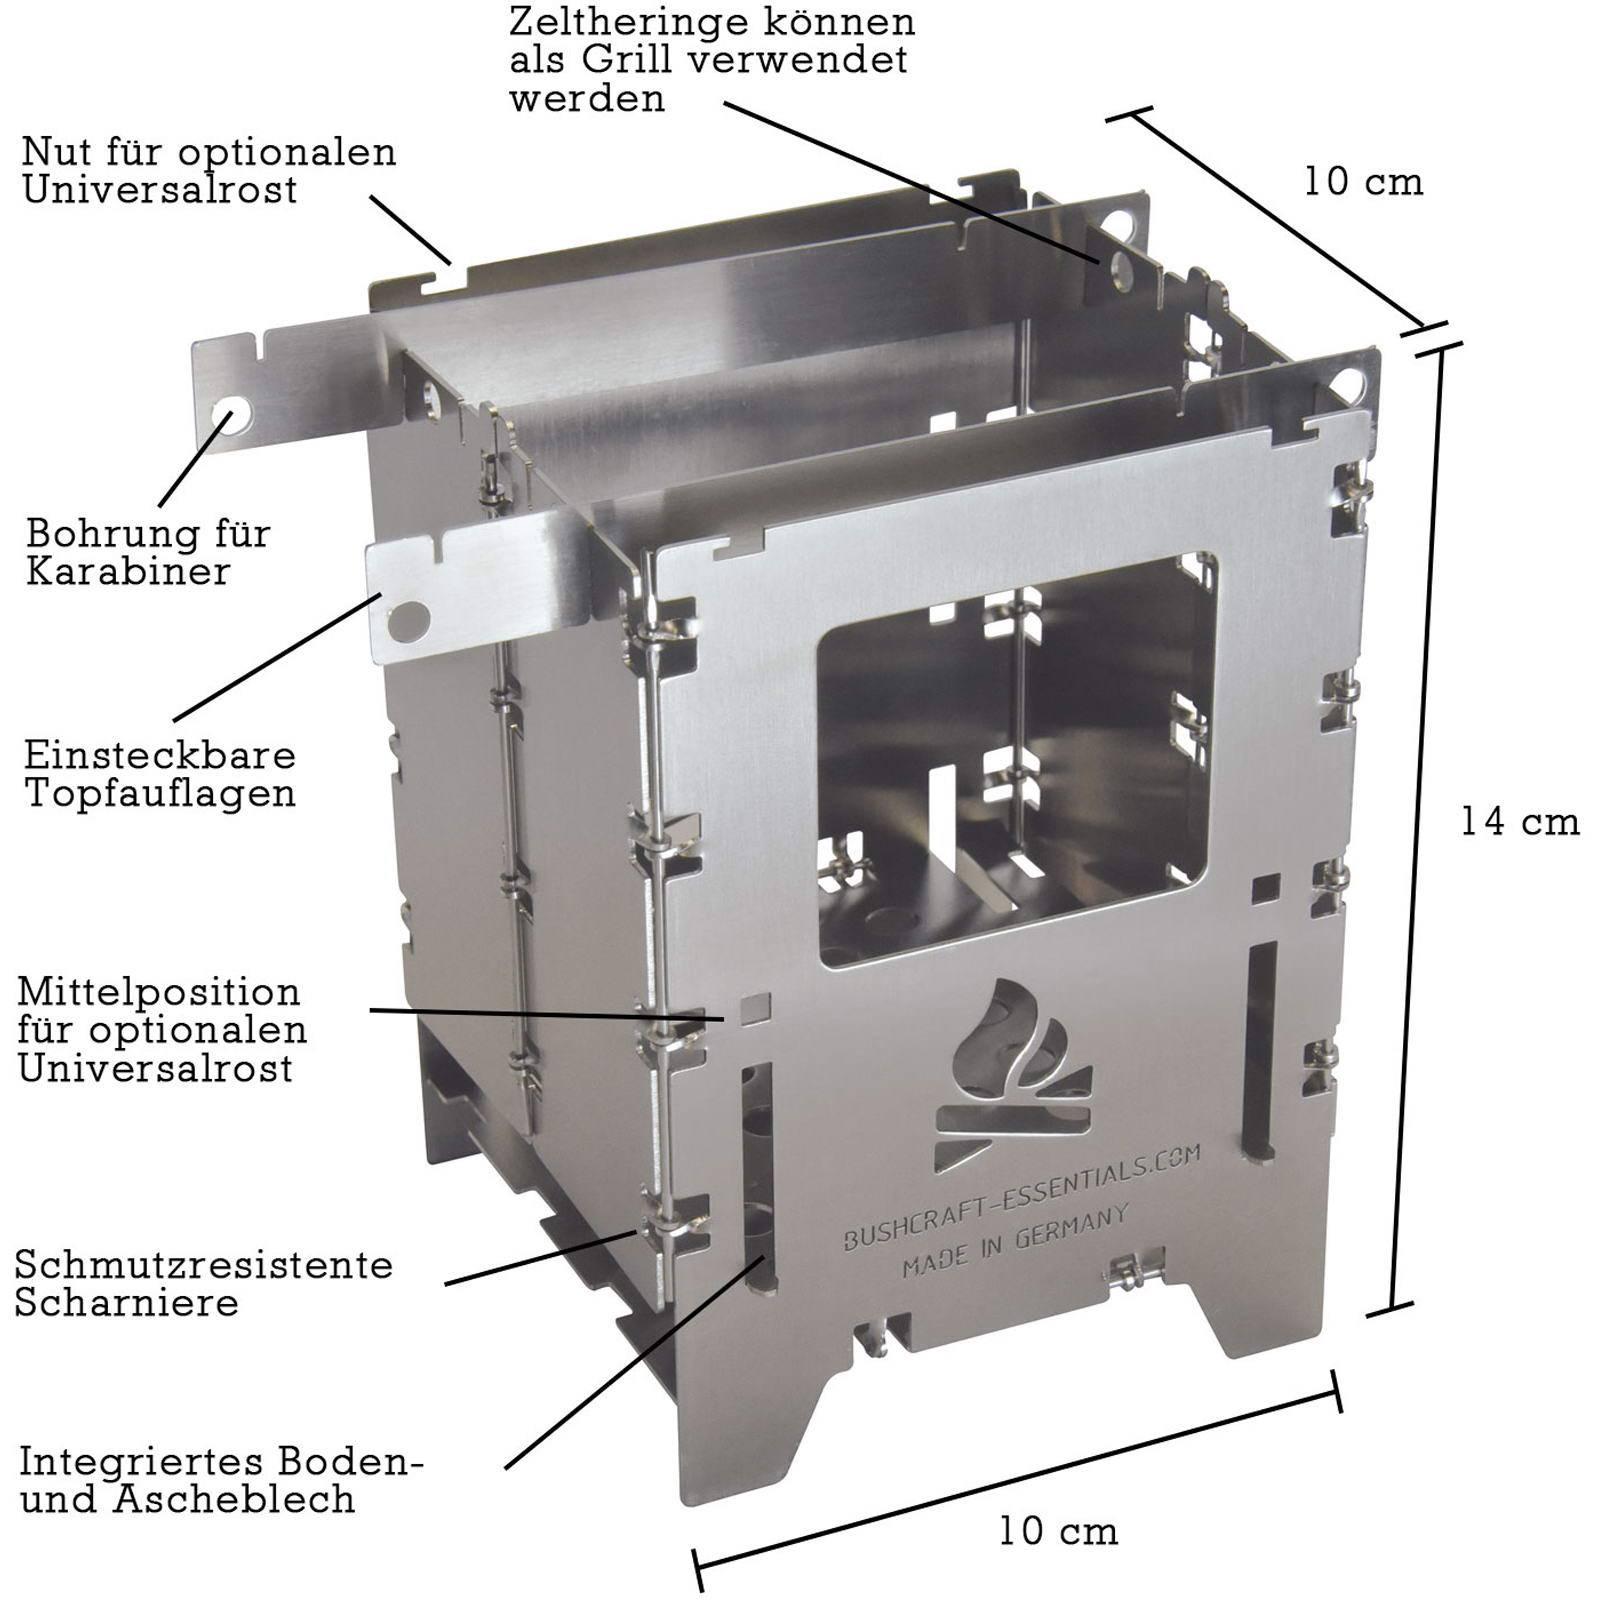 bushcraft essentials Bushbox LF Titanium - Hobo-Kocher - Bild 2